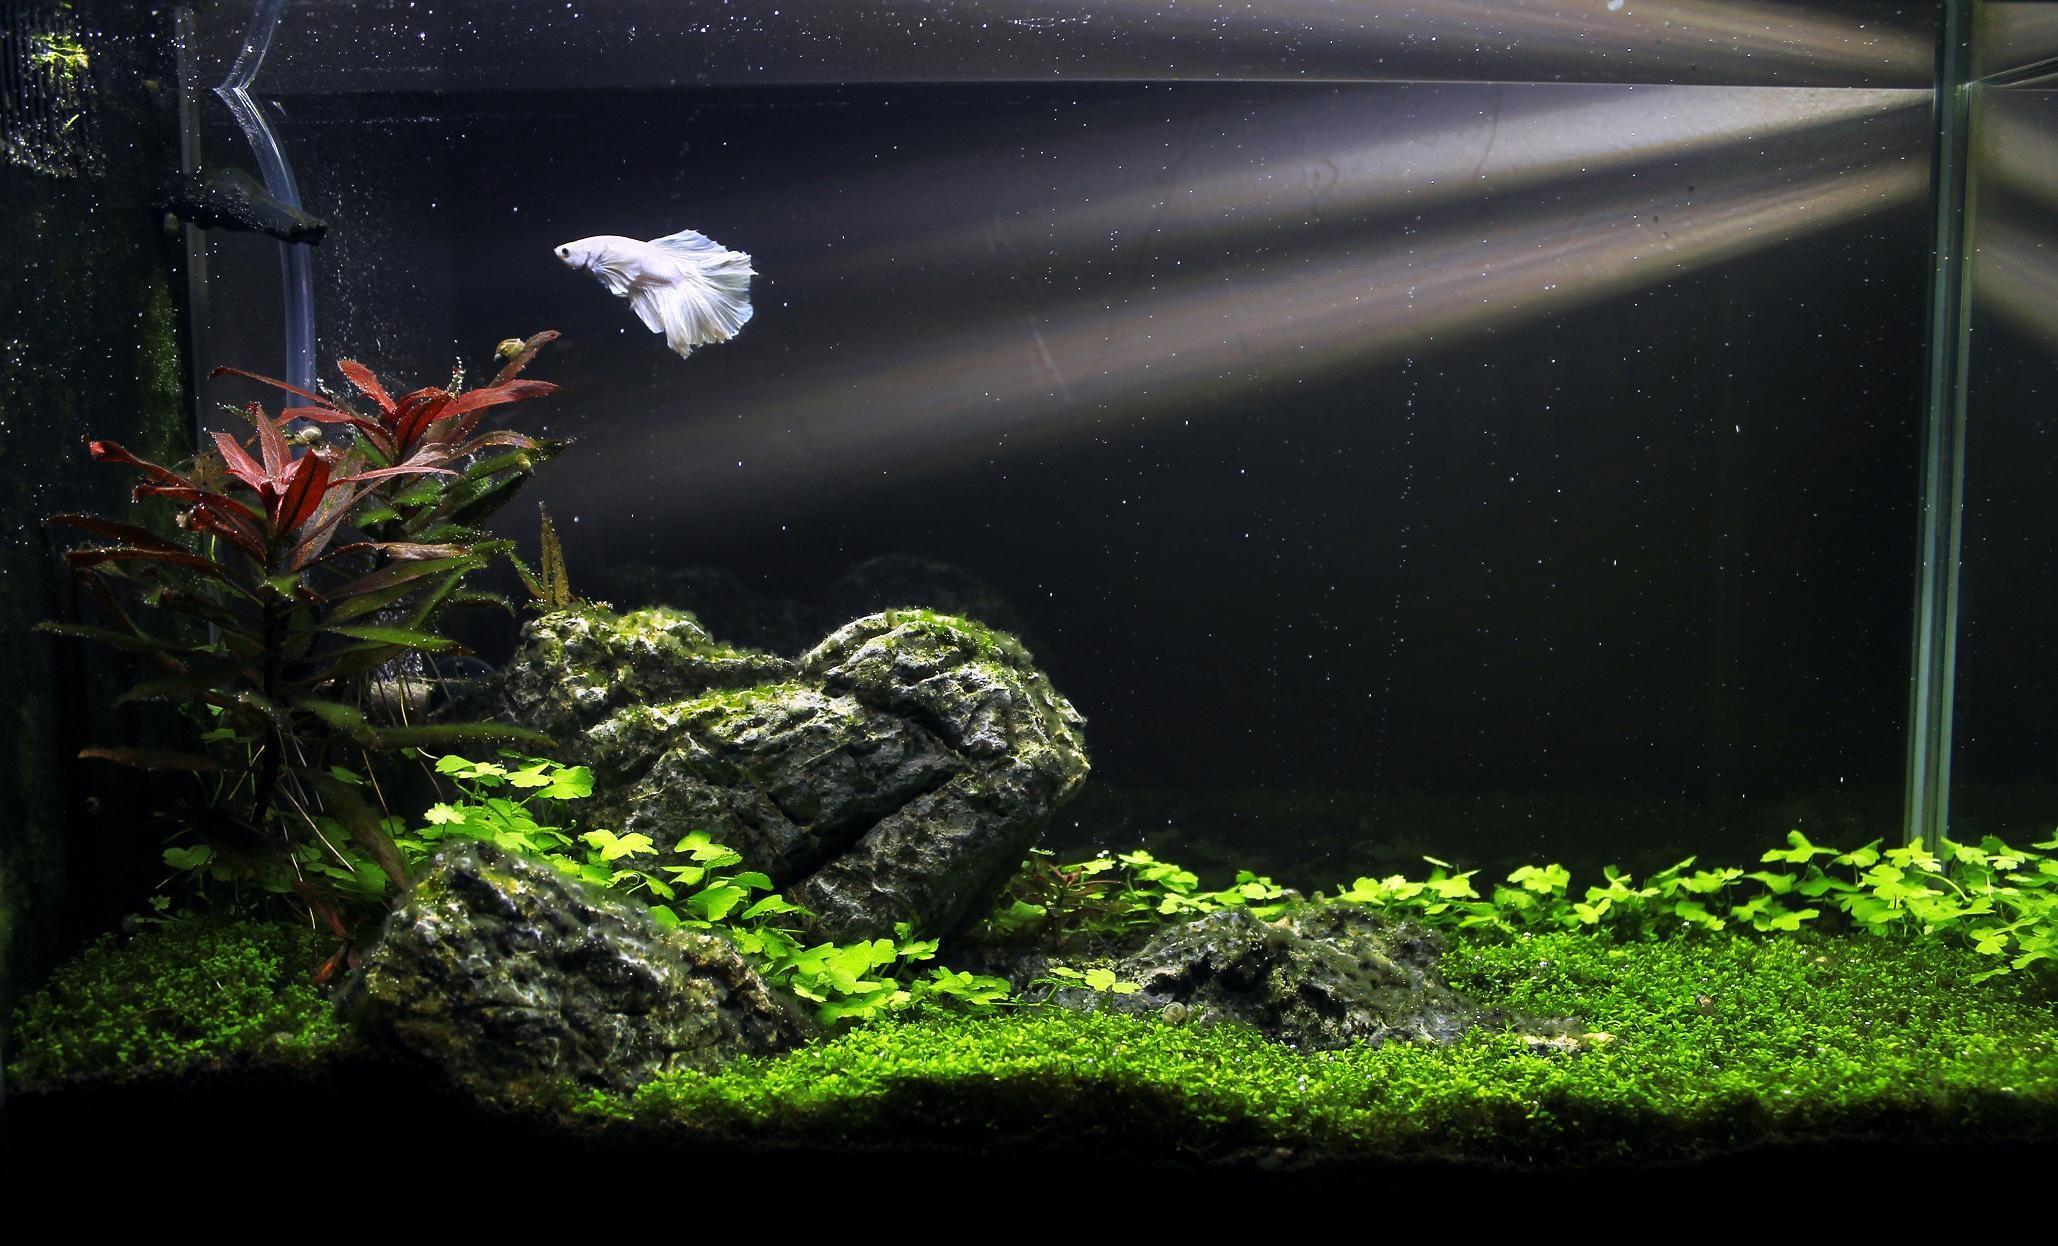 Very Nice I Am Loving The White Betta With The Green Plants And Black Background Nature Aquarium Betta Aquarium Fish Tank